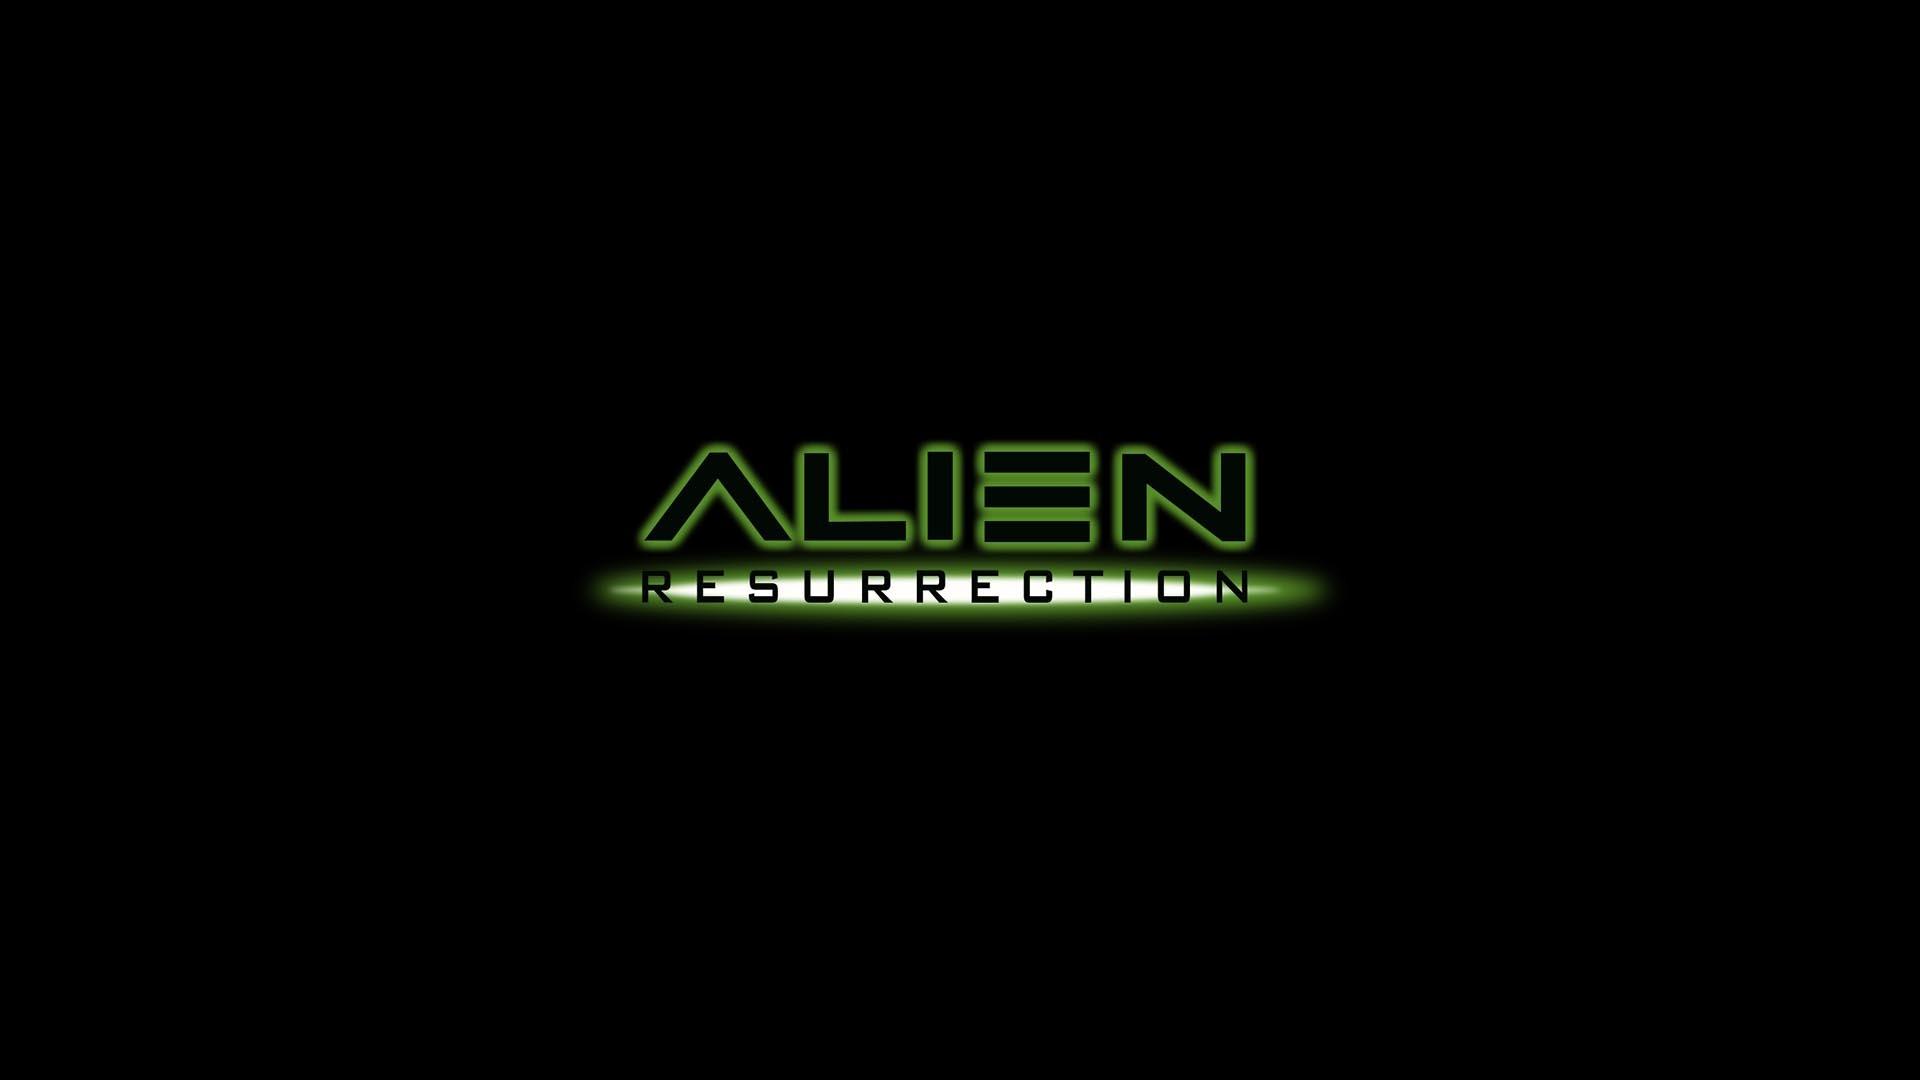 Alien Resurrection Wallpaper 45409 1920x1080